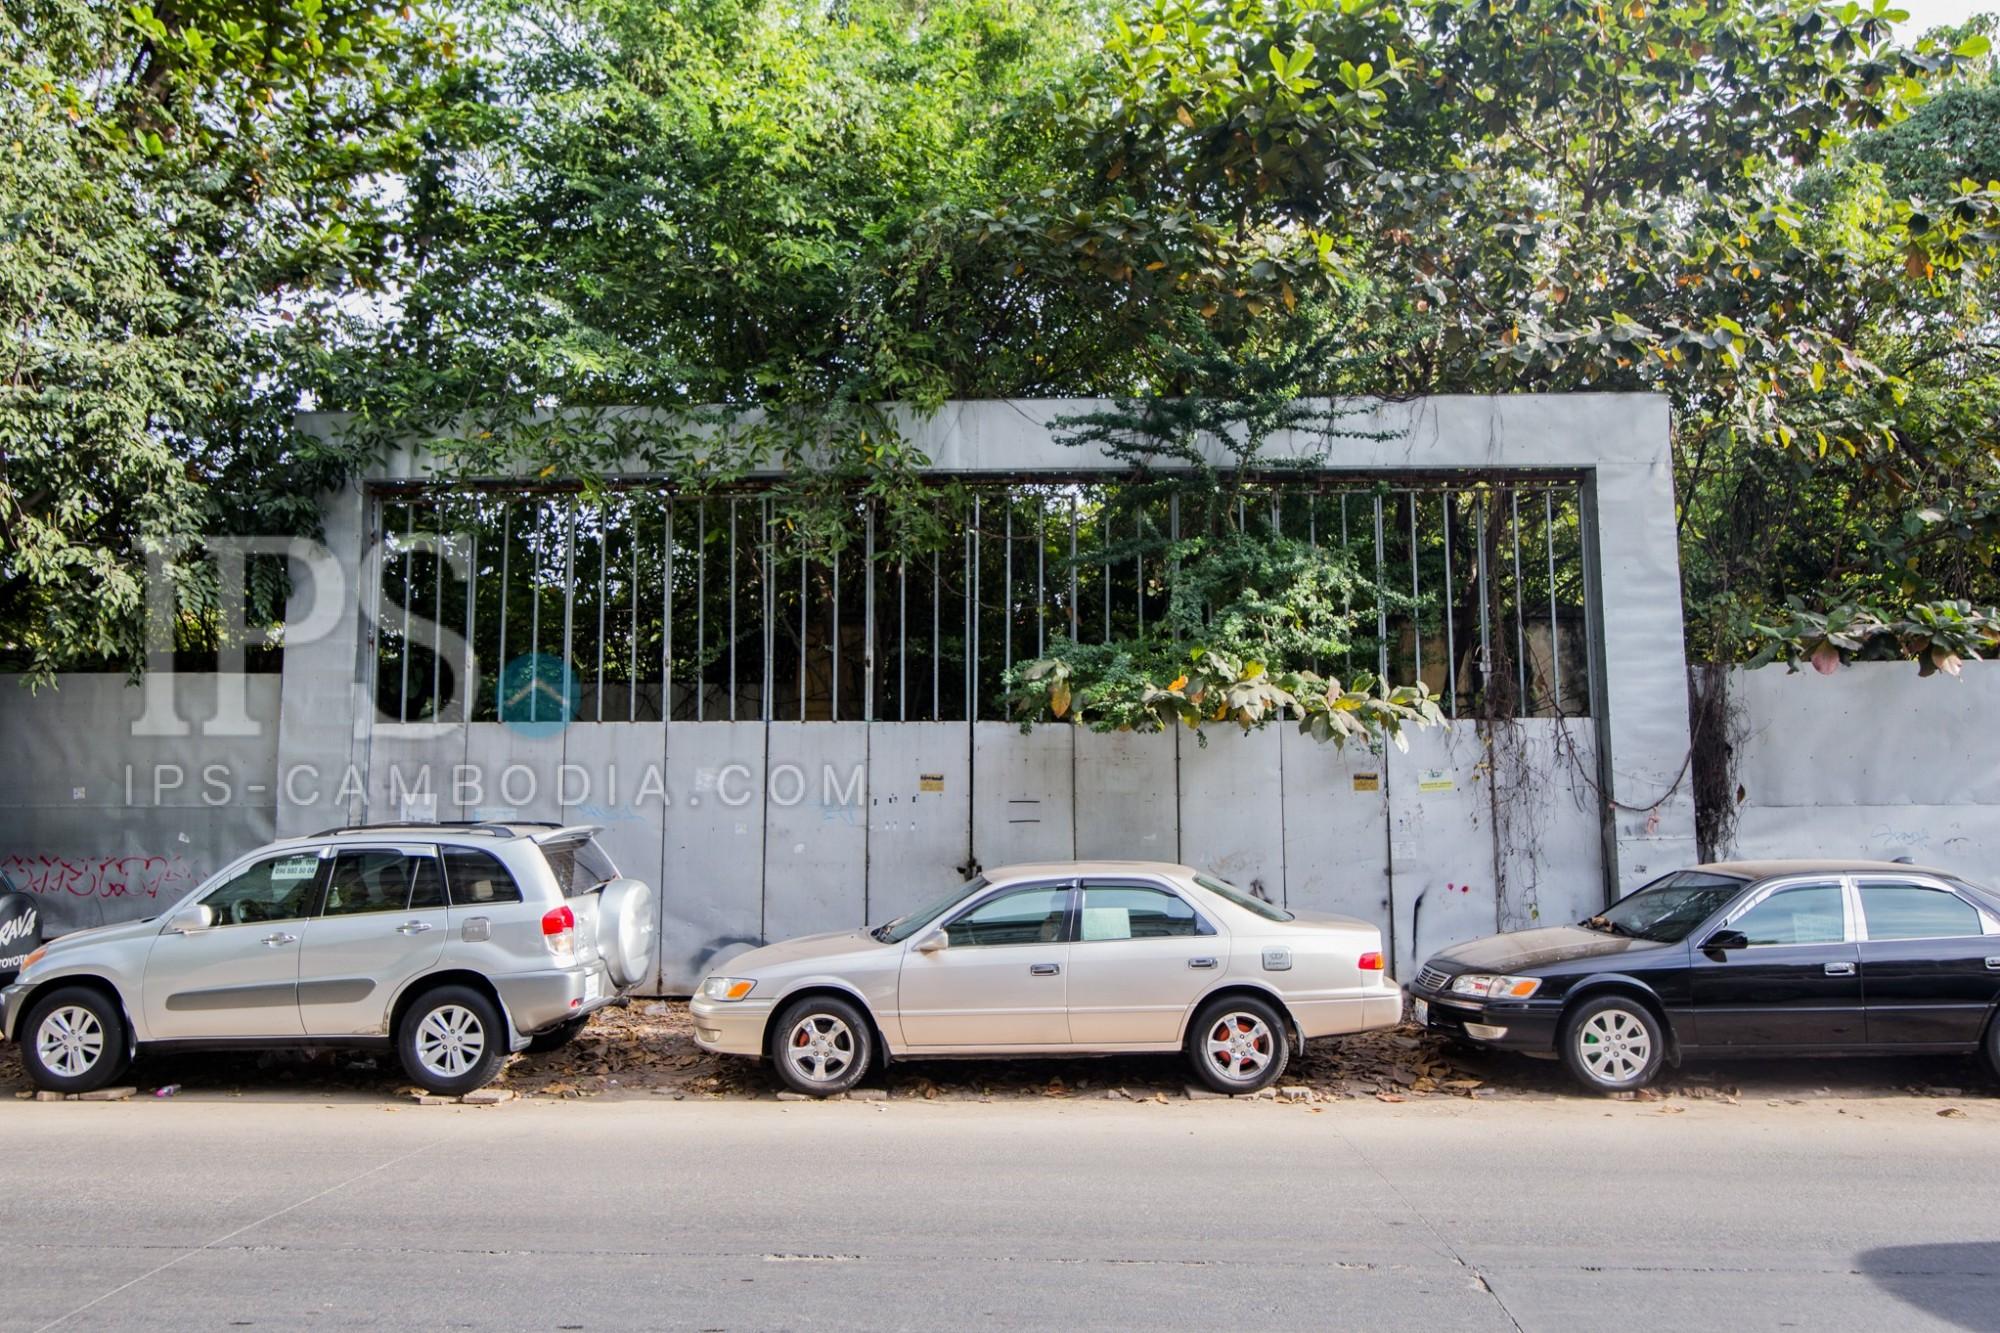 8,923 Sqm Land For Sale - Along Sisowat Quay, Phnom Penh